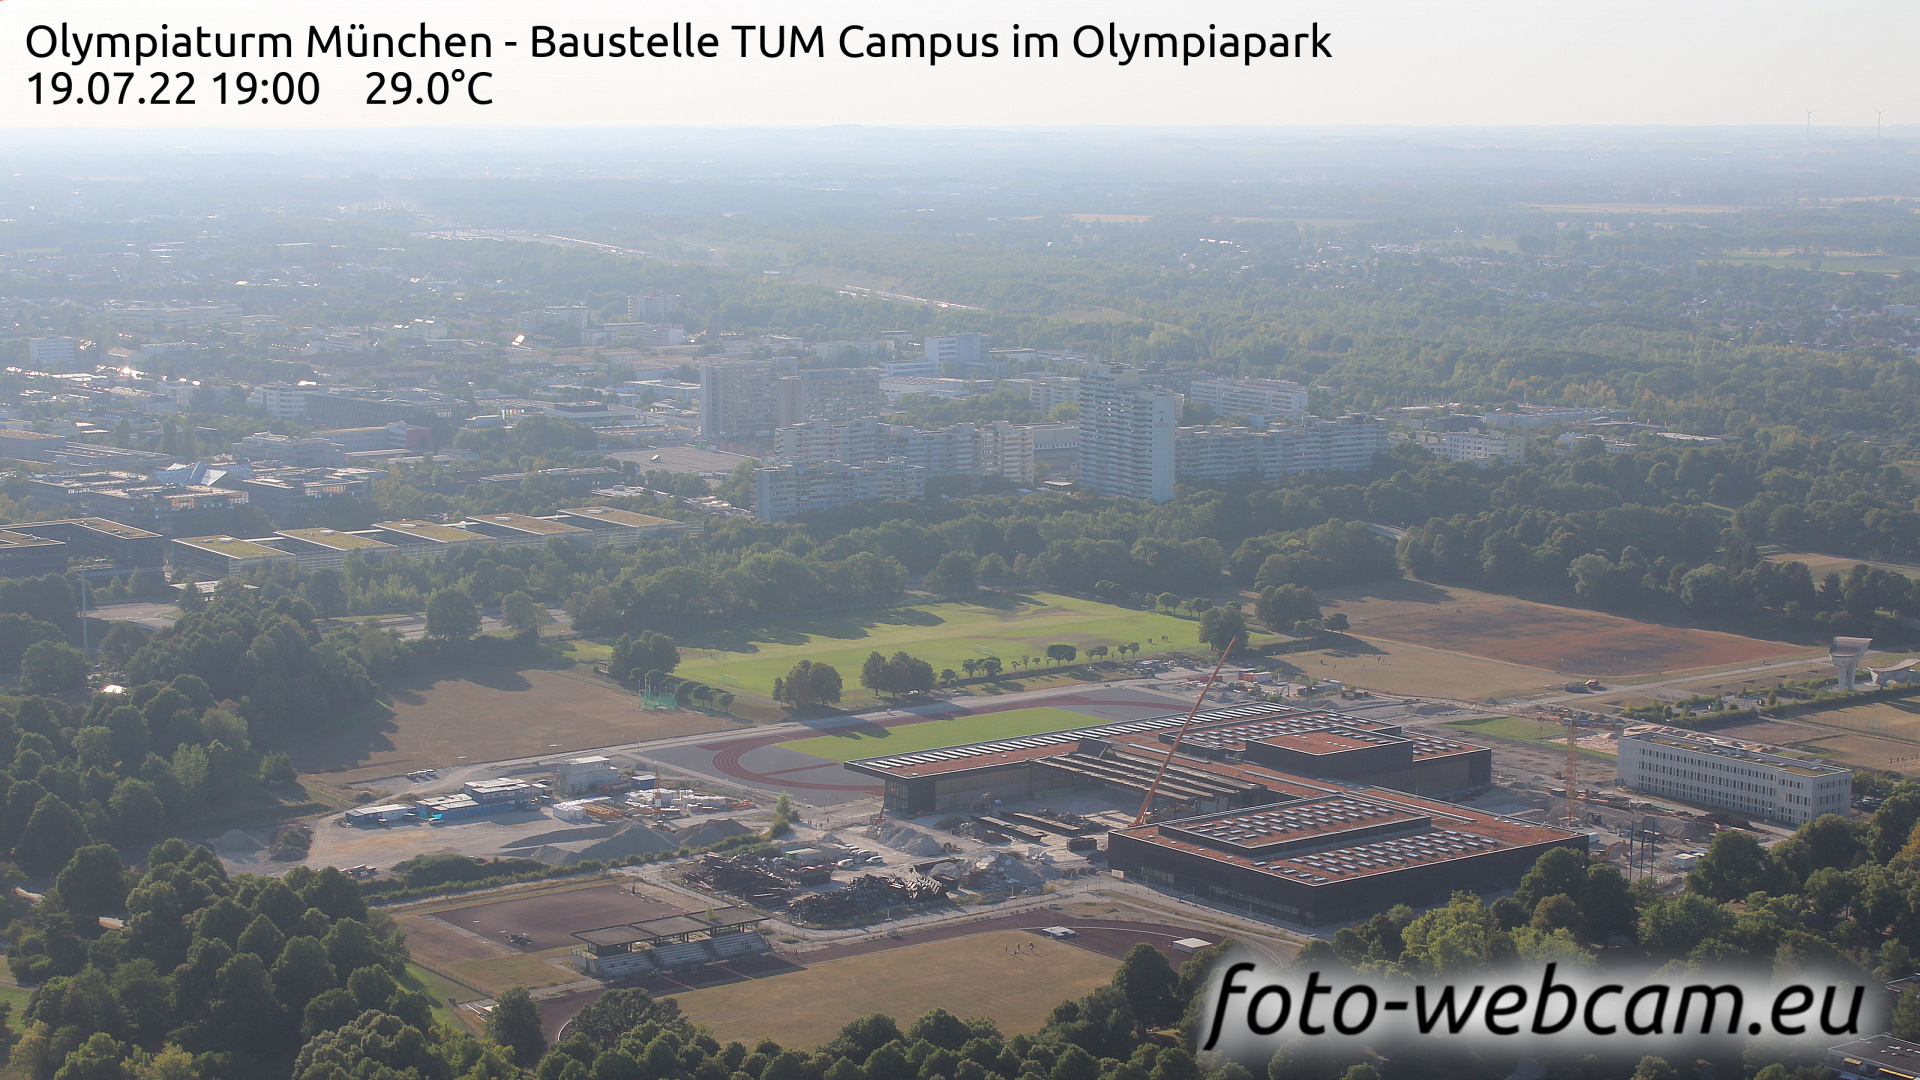 Munich Tue. 19:30